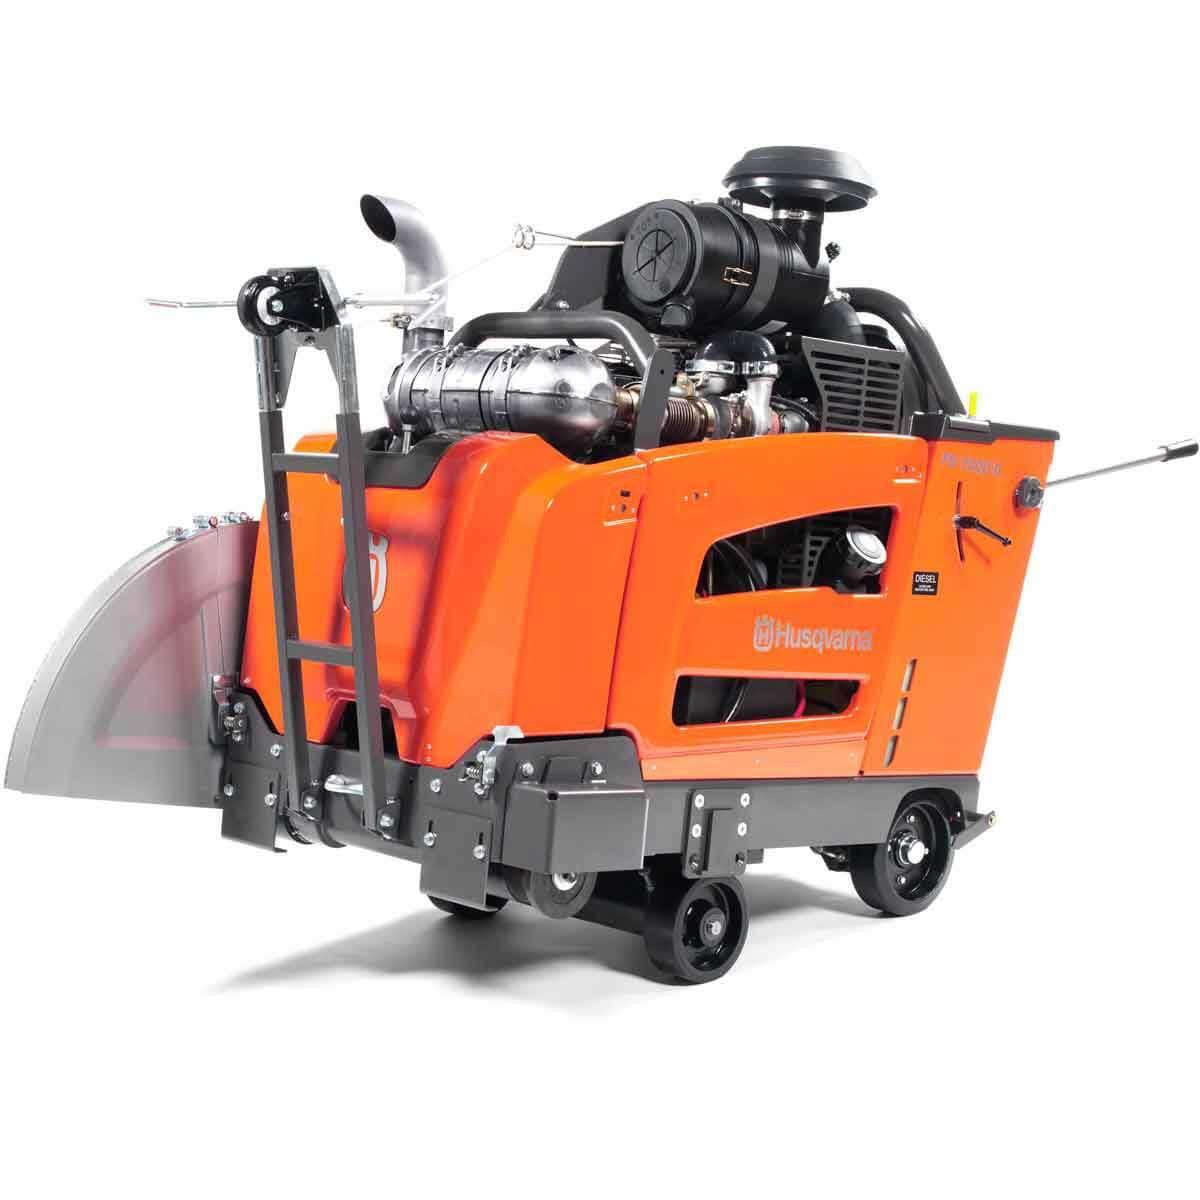 Husqvarna FS7000 asphalt saw